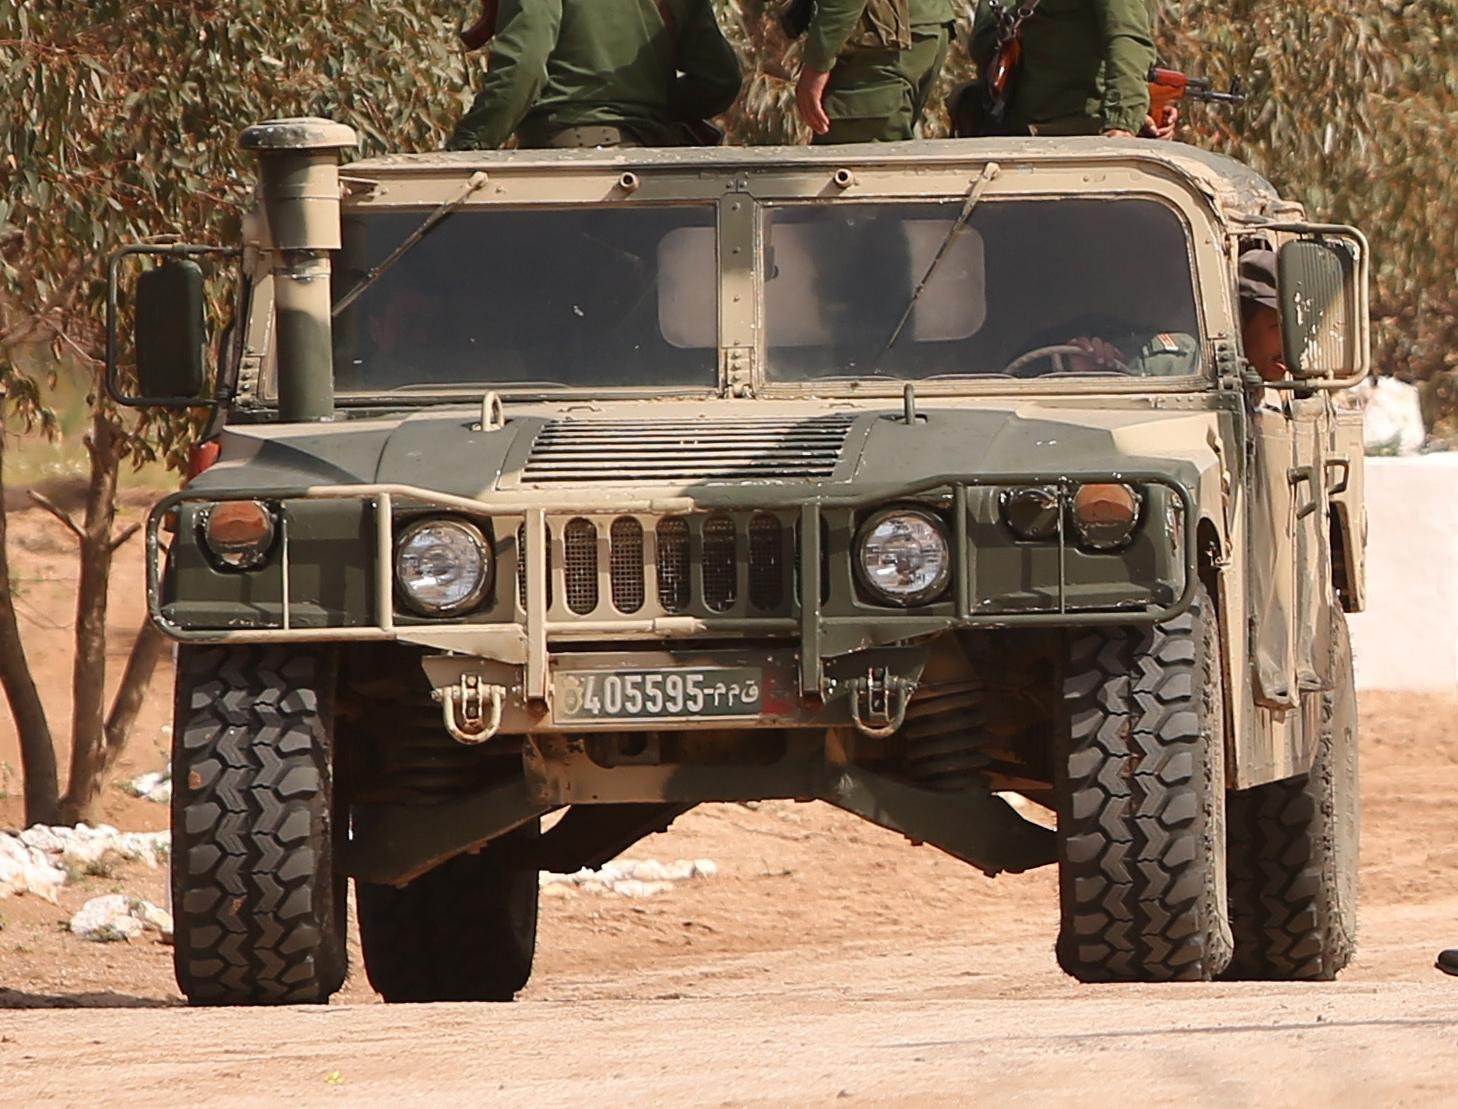 HMMWV et HMMWV Marine Armor Kit (MAK)  - Page 5 49250843766_c46654ebe4_o